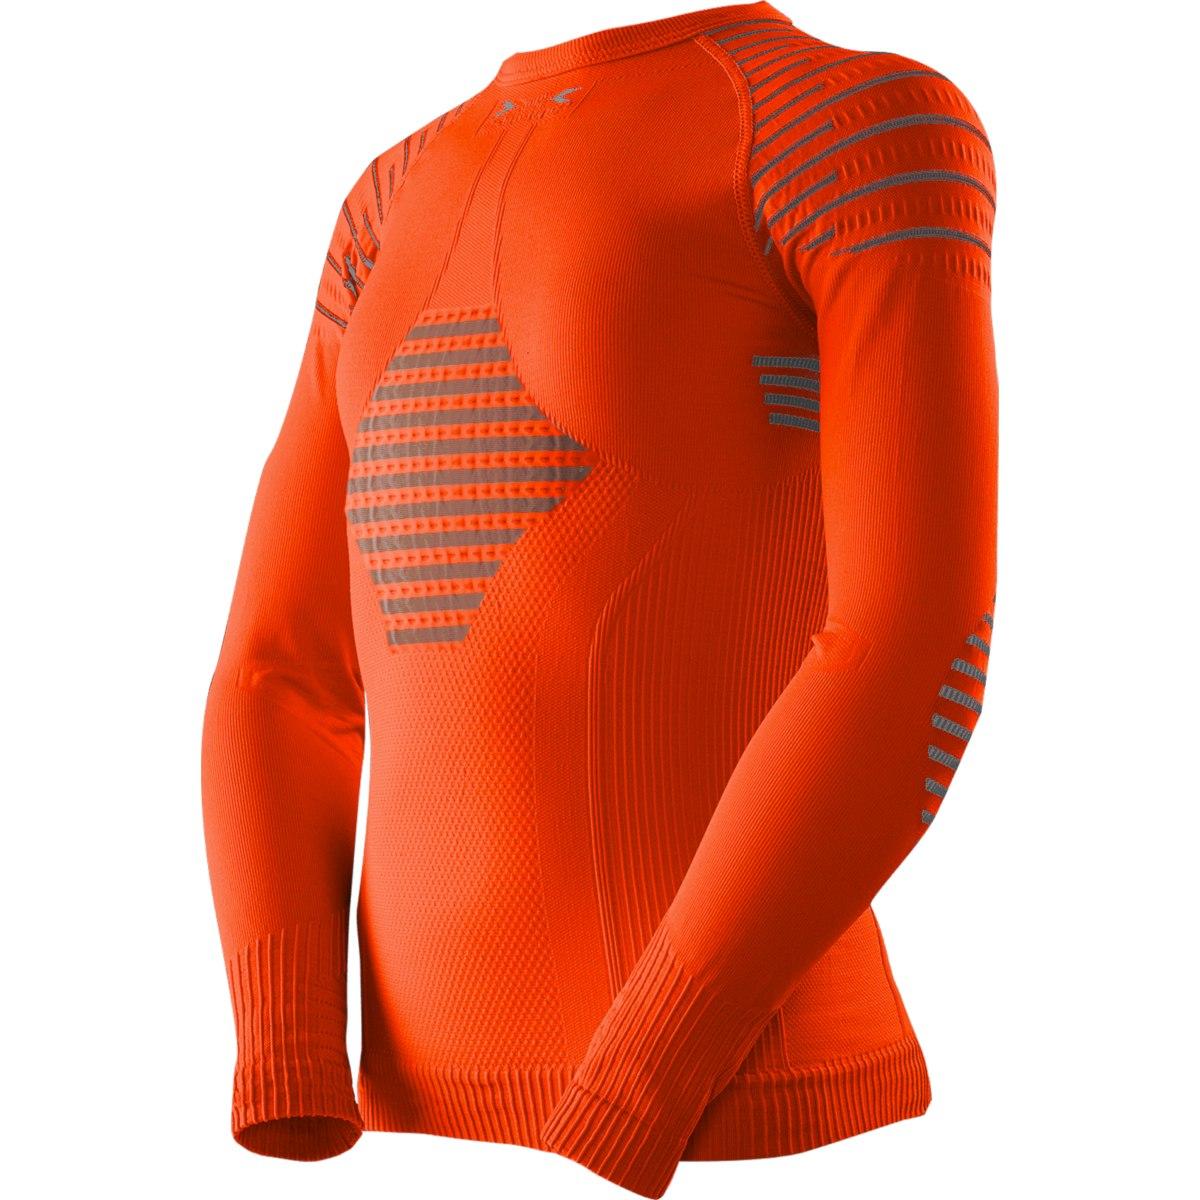 X-Bionic Invent 4.0 Shirt Round Neck Camiseta de manga larga para niños - sunset orange/anthracite